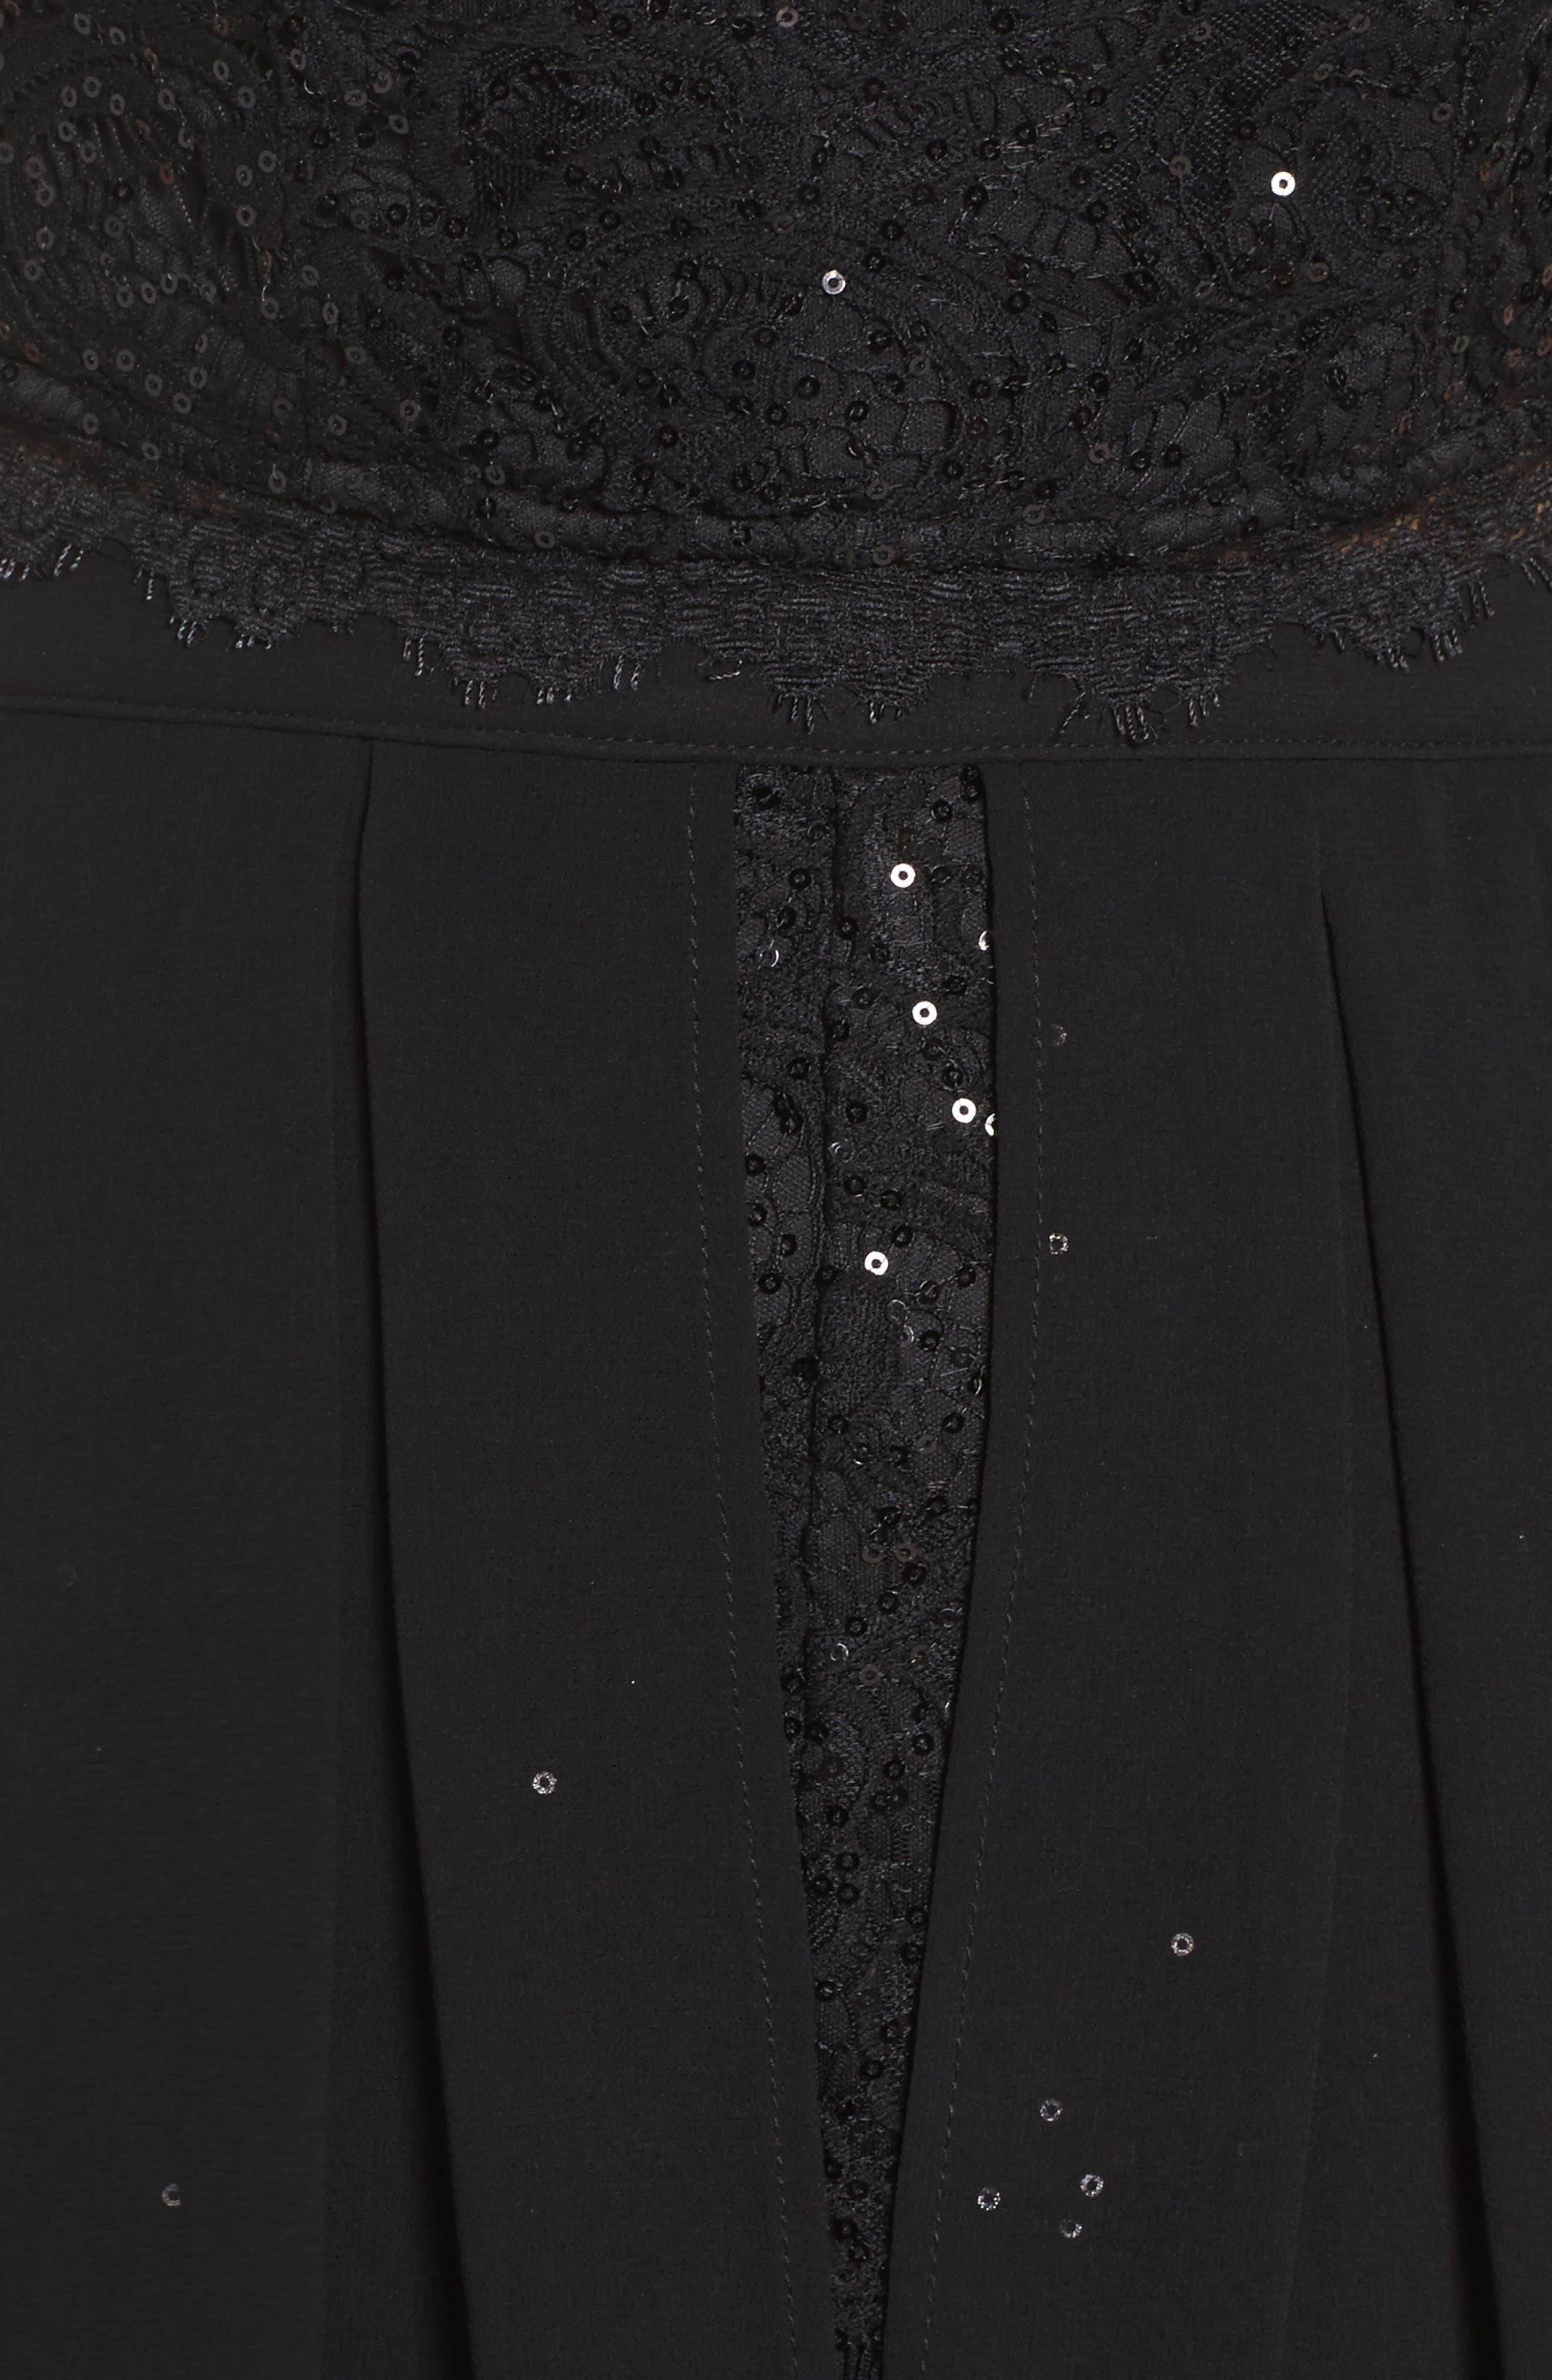 Sequin Lace Two-Piece Romper,                             Alternate thumbnail 5, color,                             001